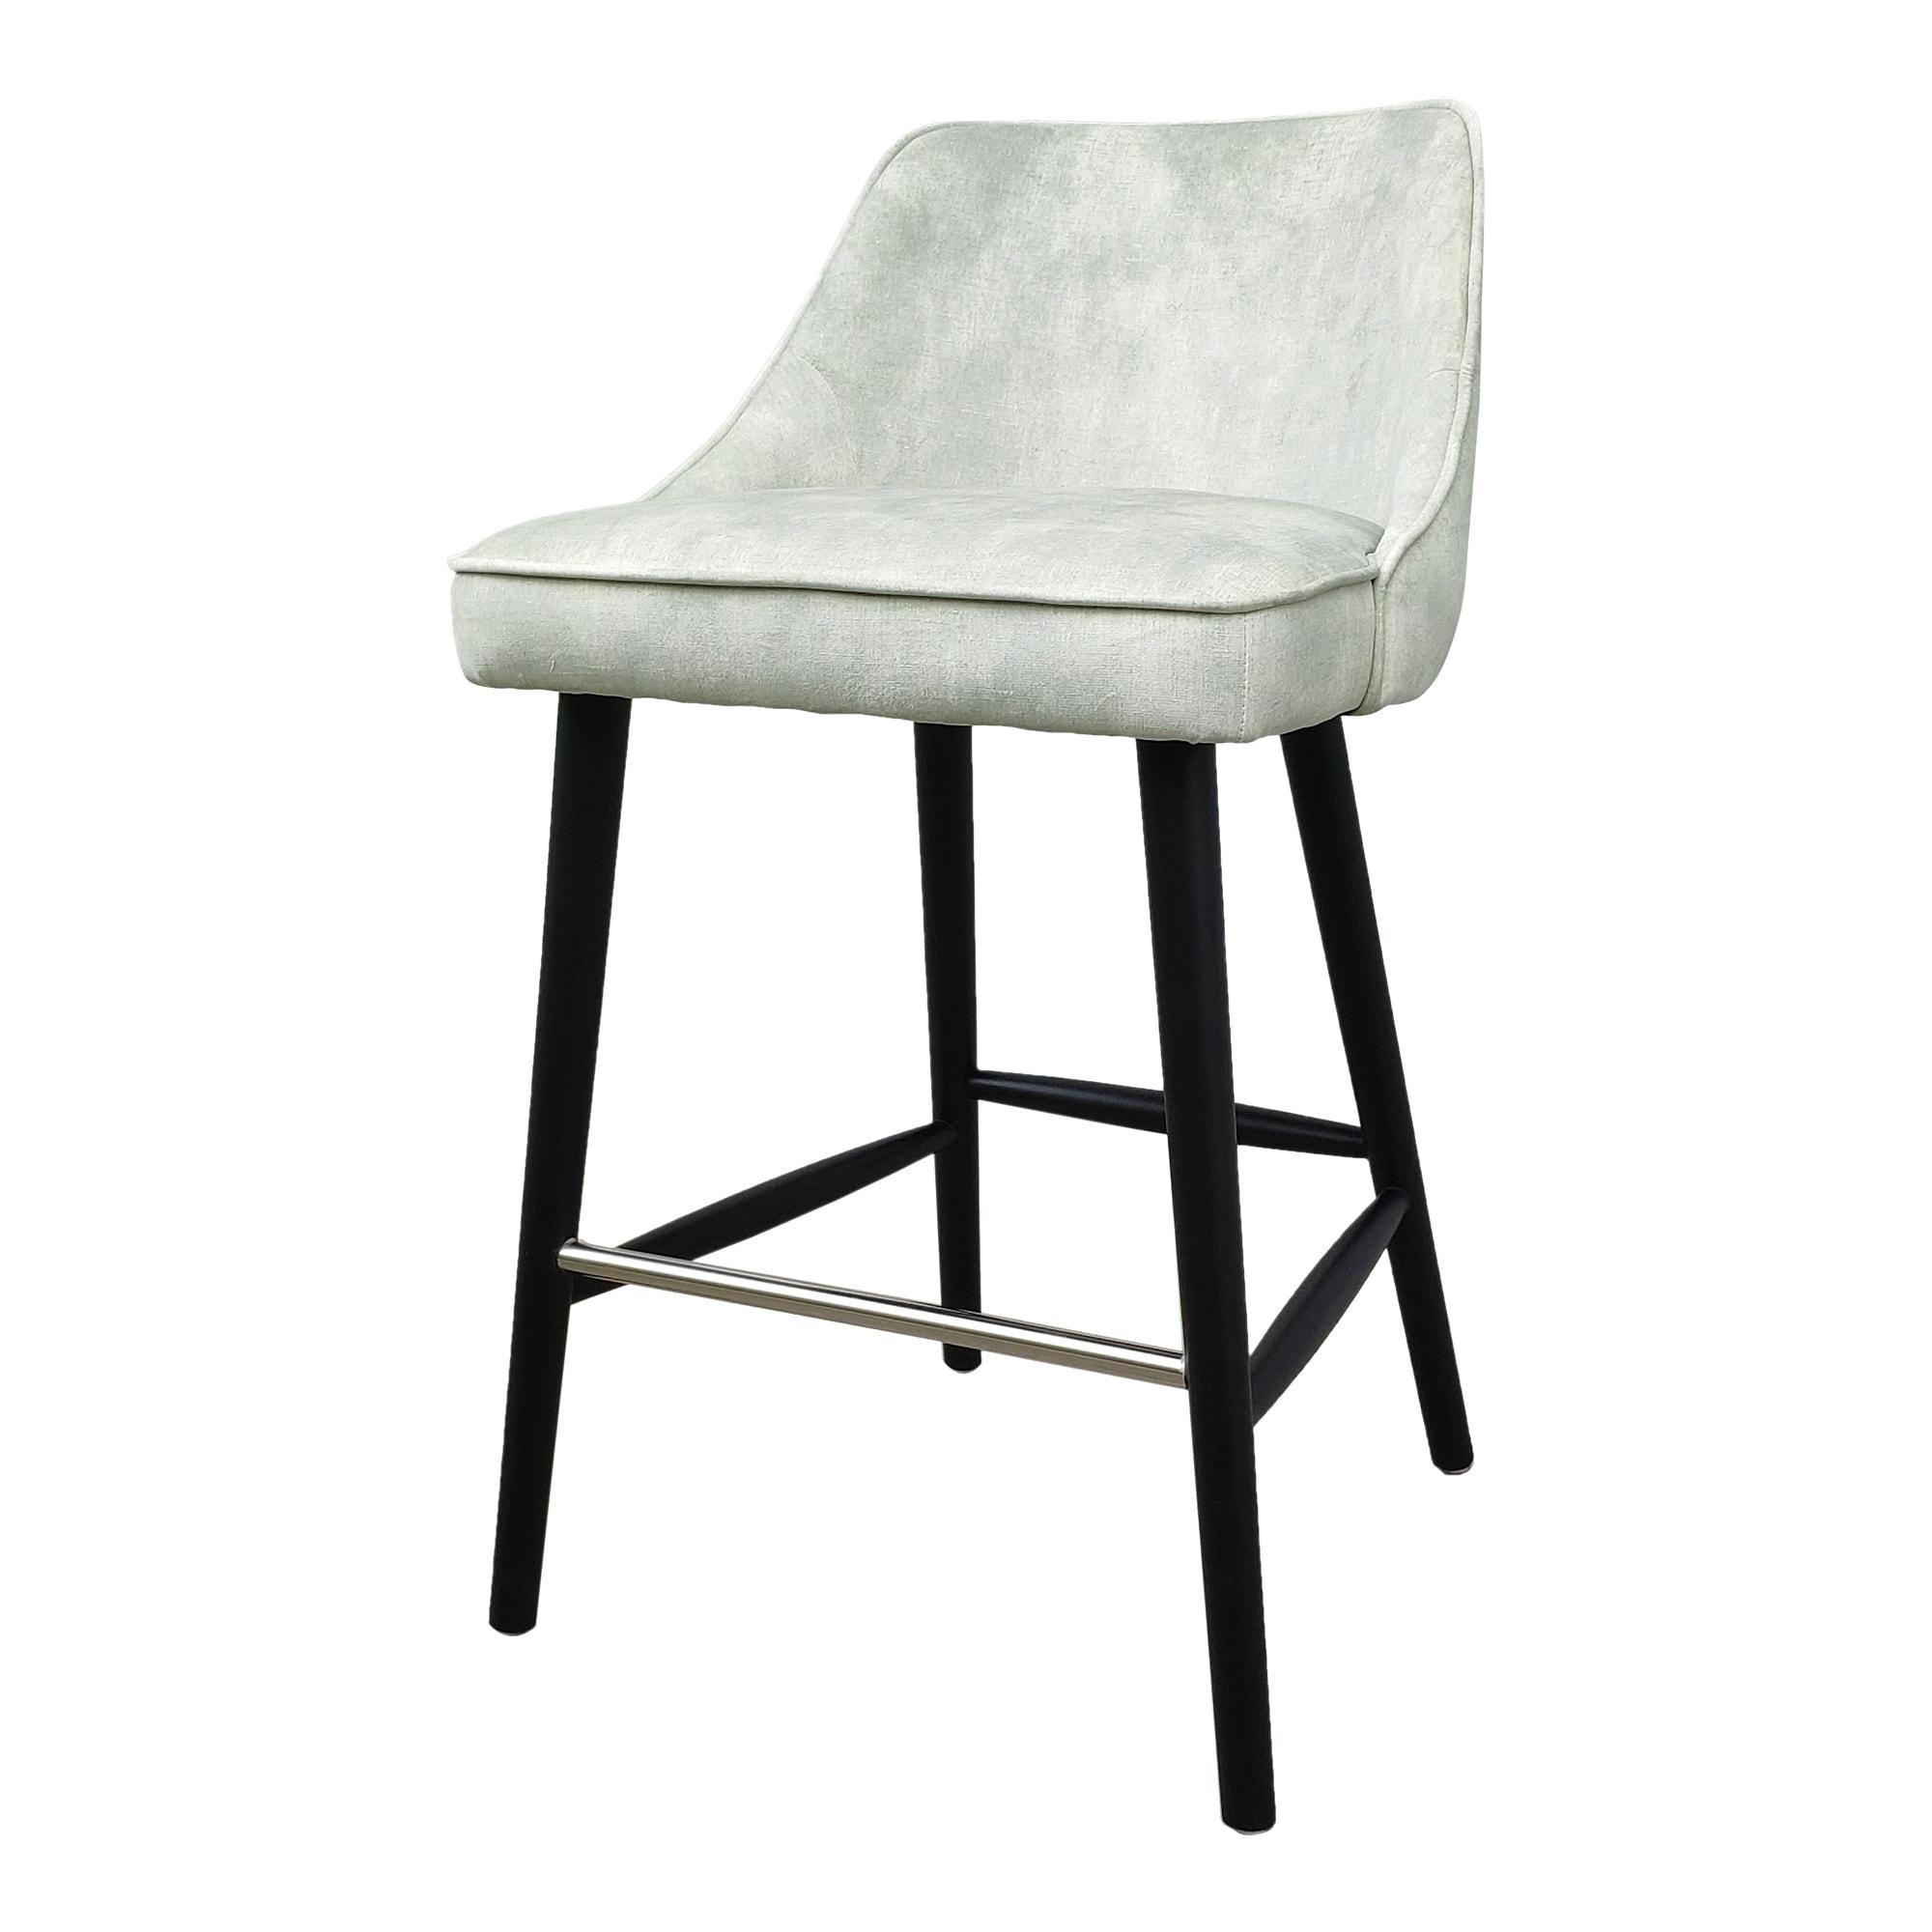 Image of: Shop Black Friday Deals On Aurelle Home Velvet Mid Century Modern Counter Stool 35 5 X 22 X 21 Overstock 29094948